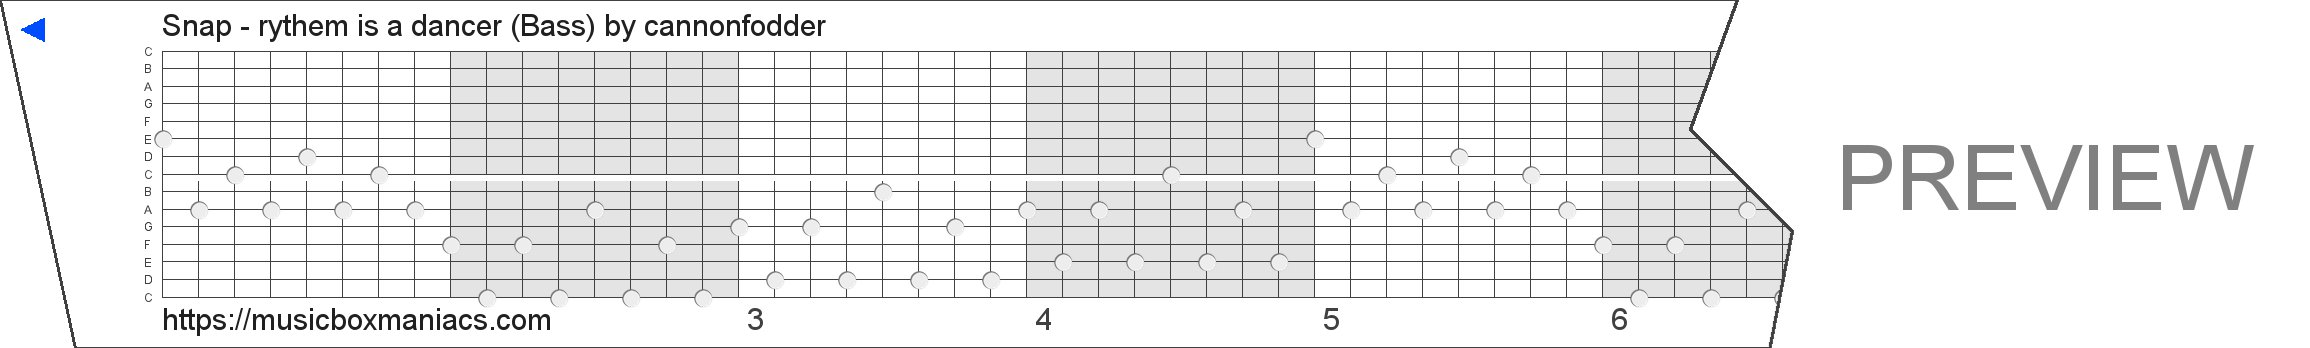 Snap - rythem is a dancer (Bass) 15 note music box paper strip